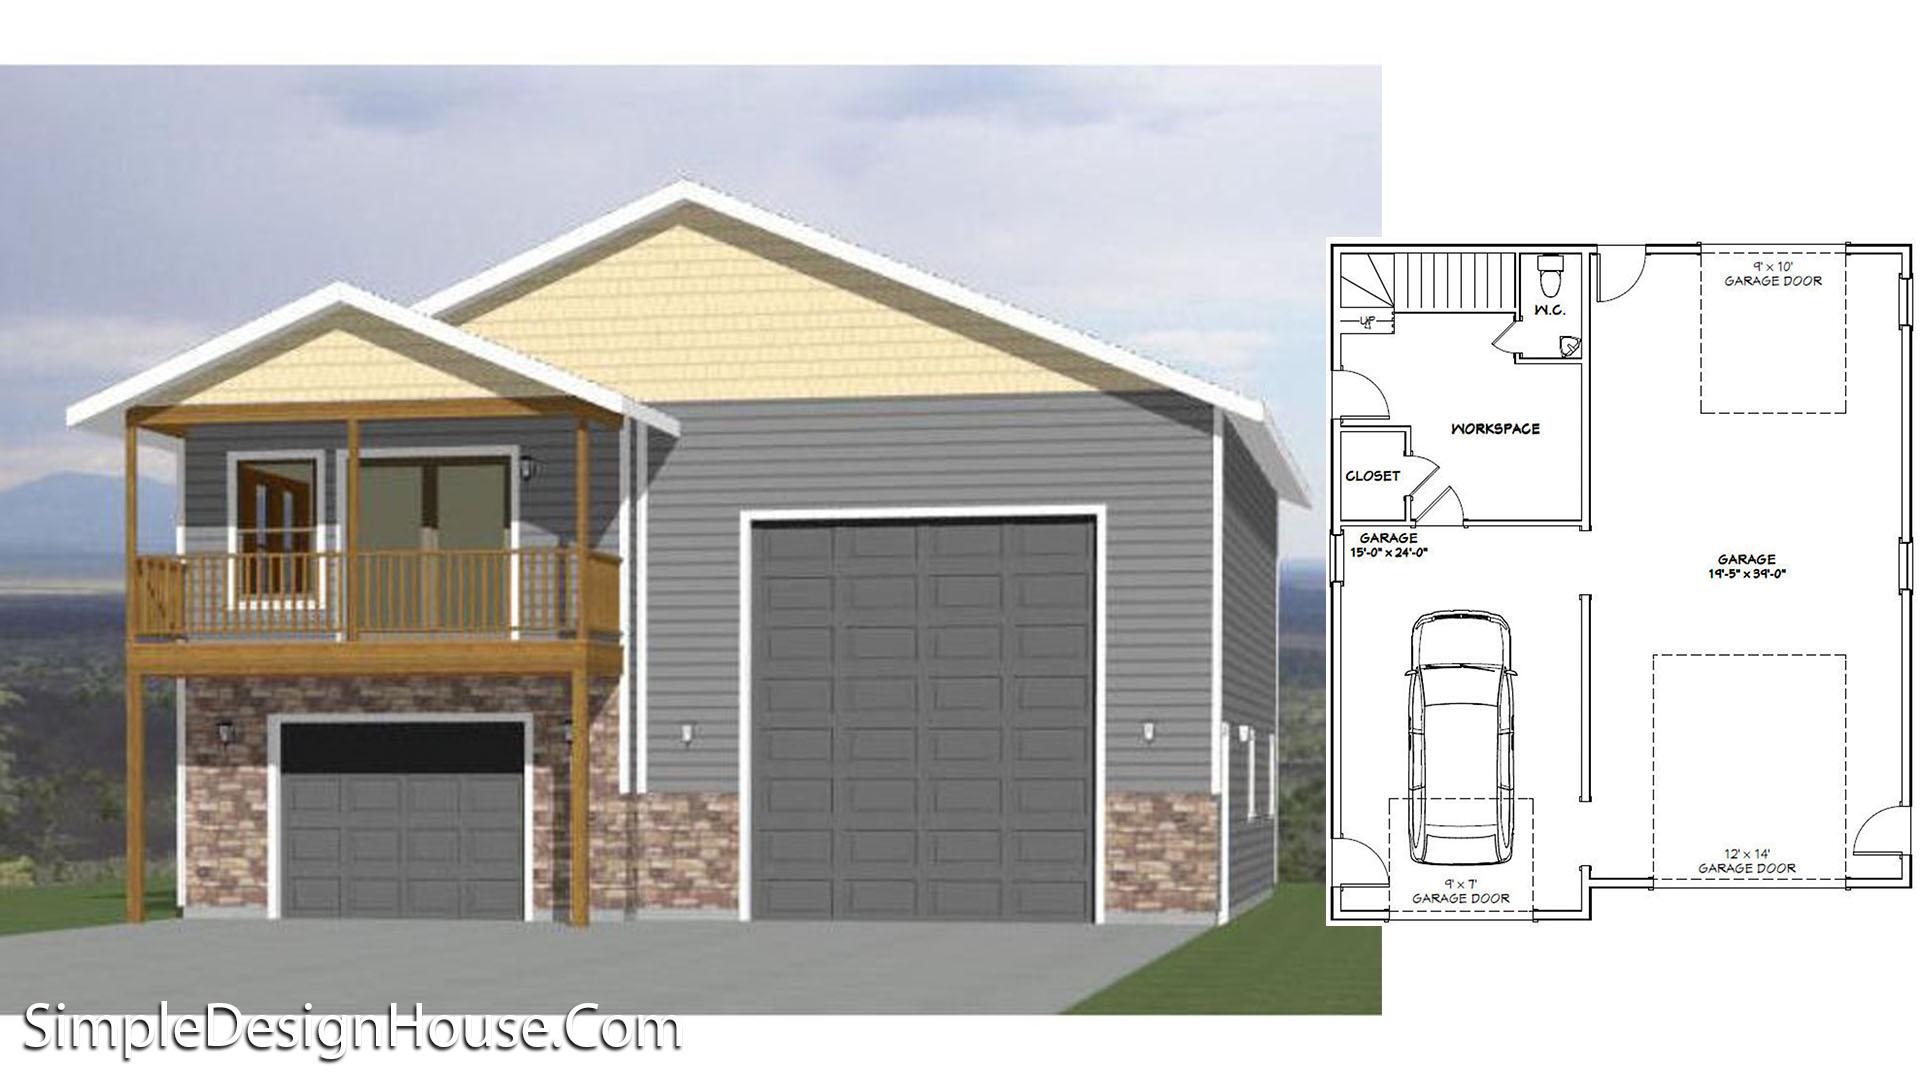 36×42 House Plans 1 Bed 853 sq ft PDF Floor Plan